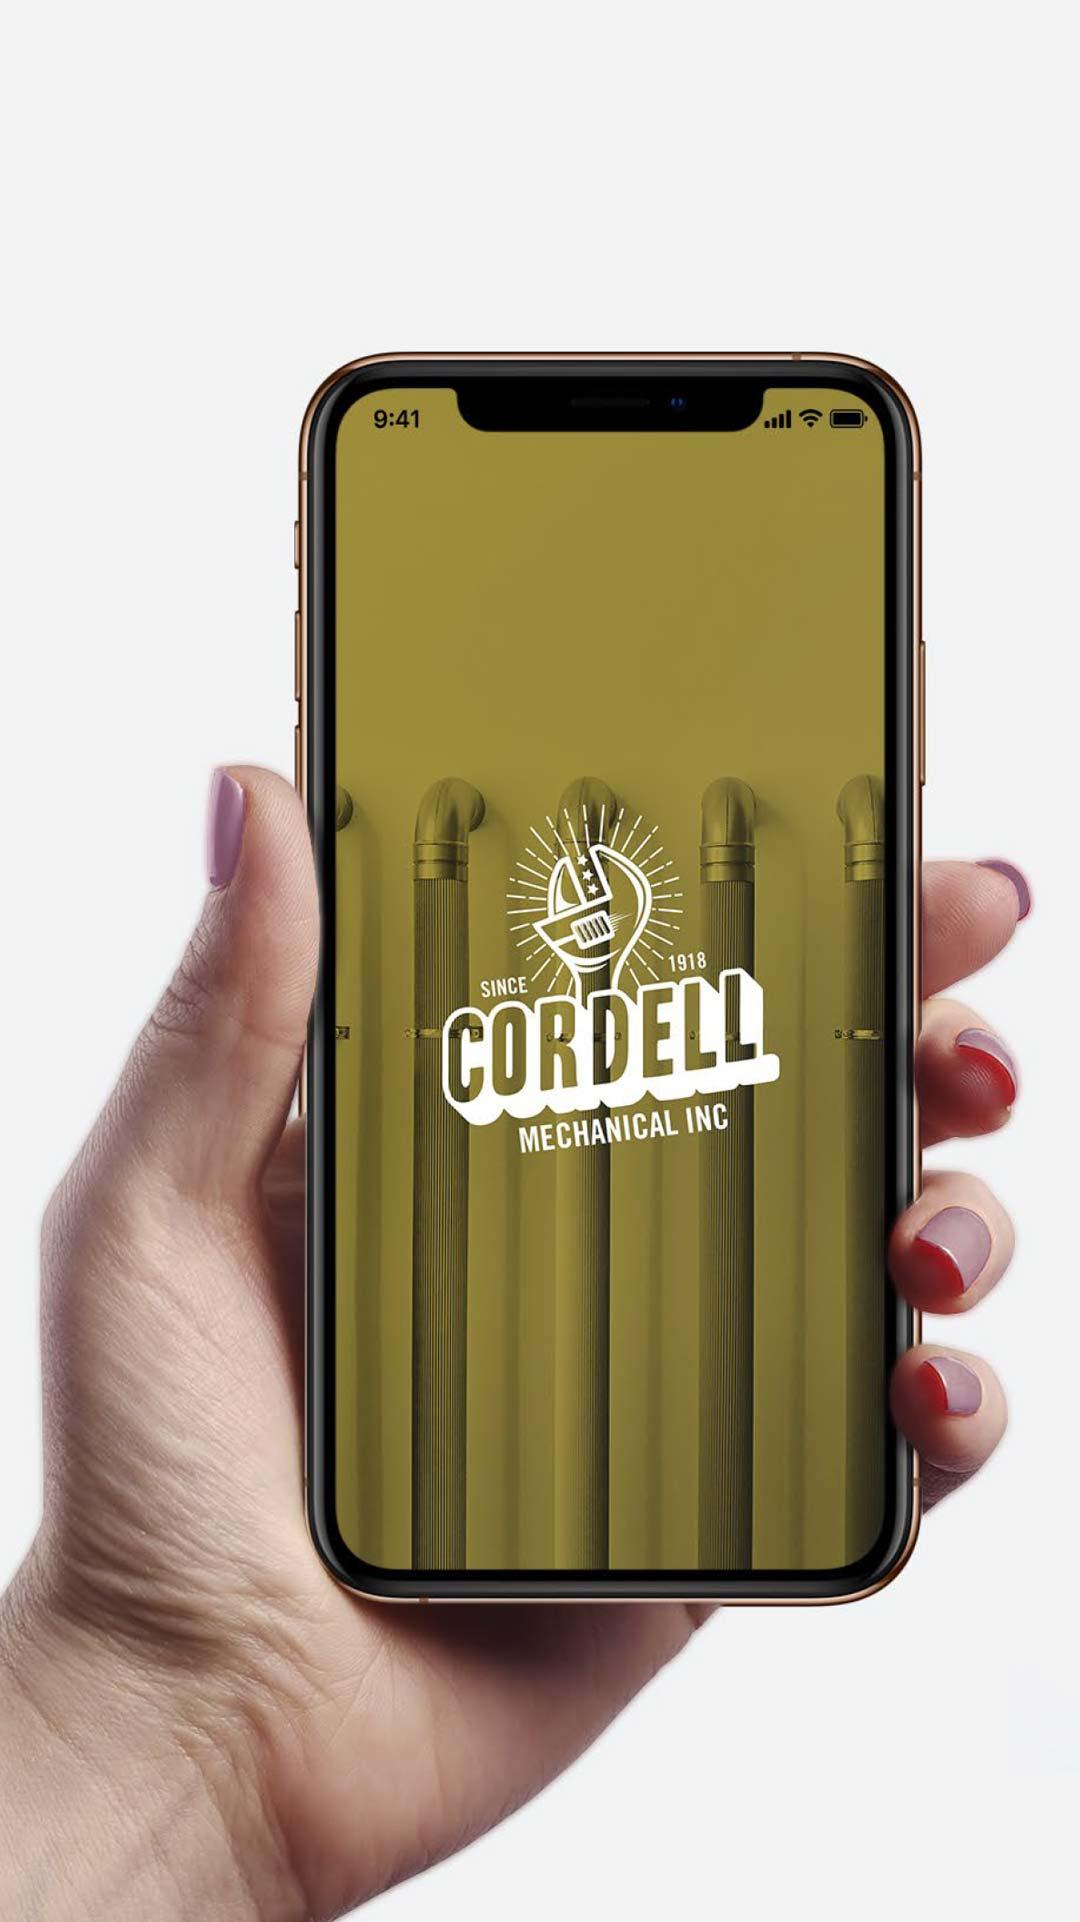 Graphic Design Services Toronto - Cordell Mechanical Inc.